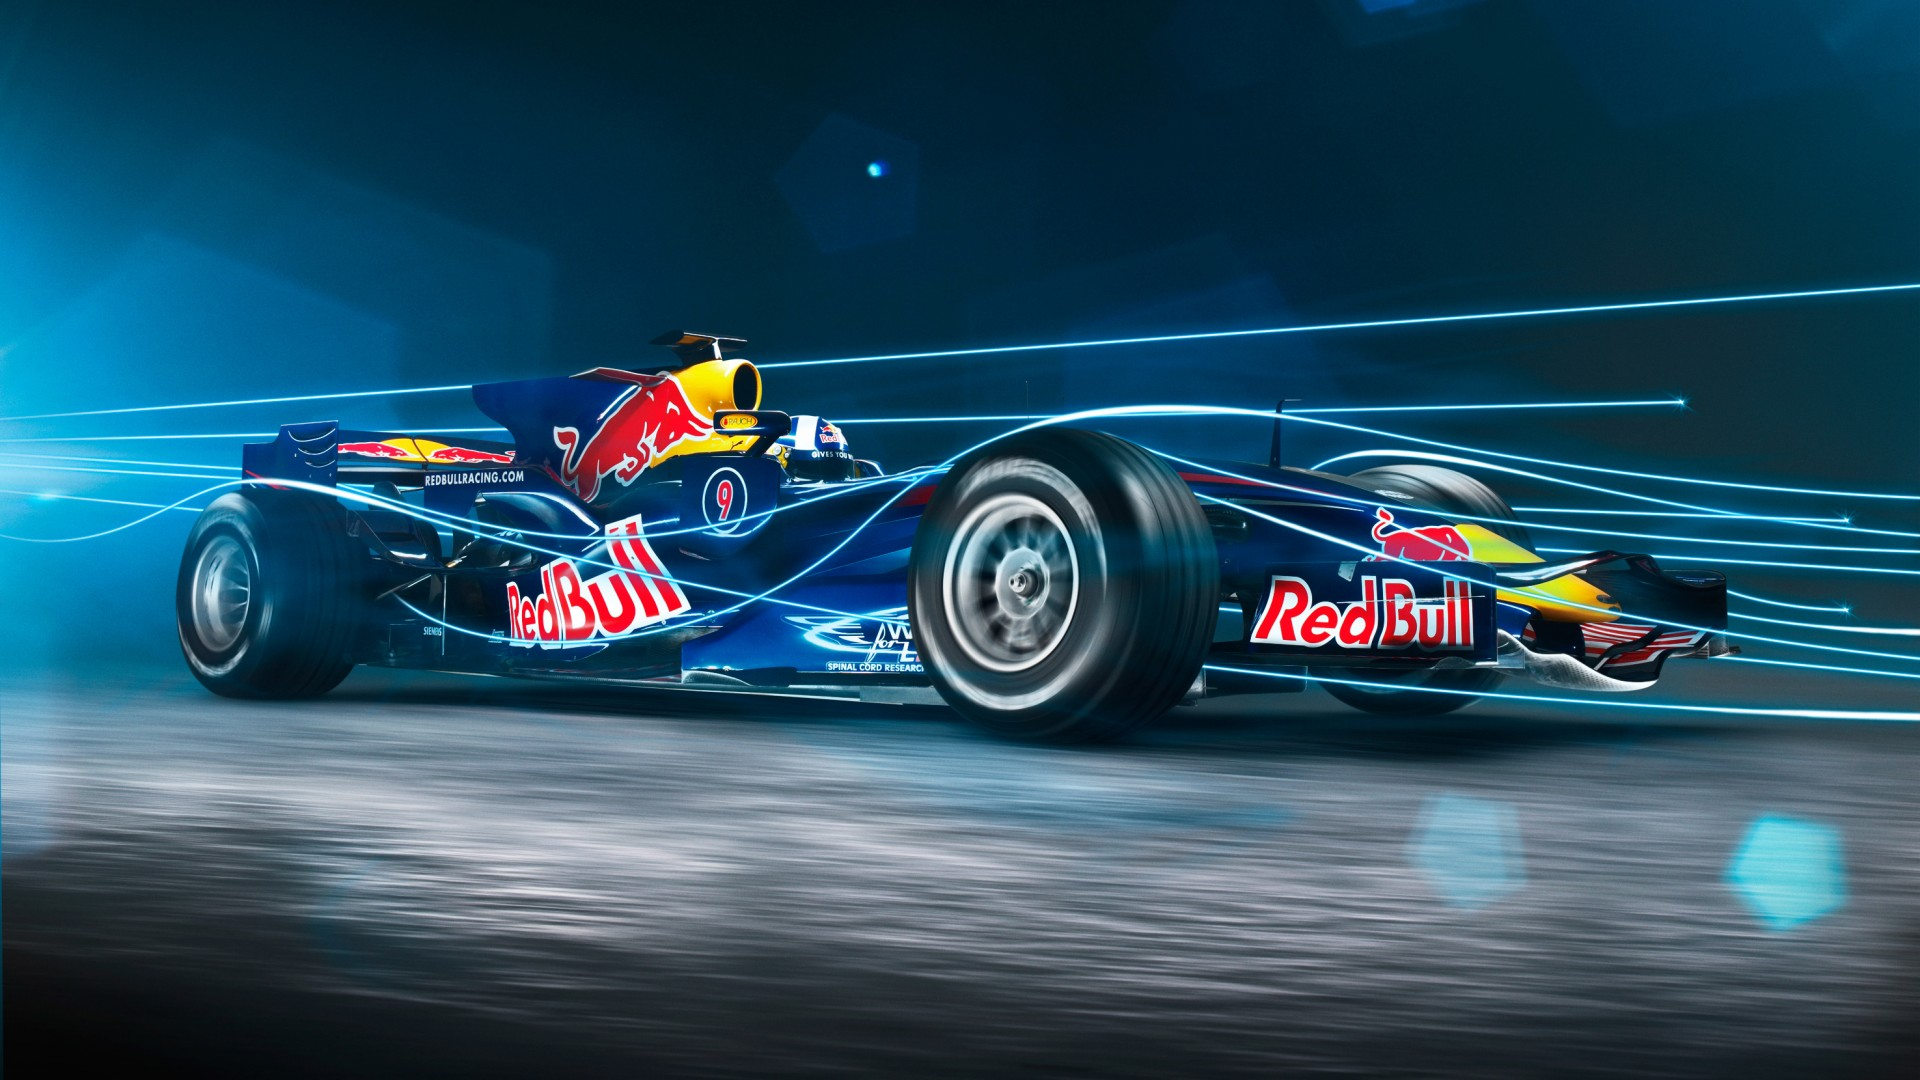 Red bull Racing F1 HD Wallpaper | HD Car Wallpapers | ID #8031